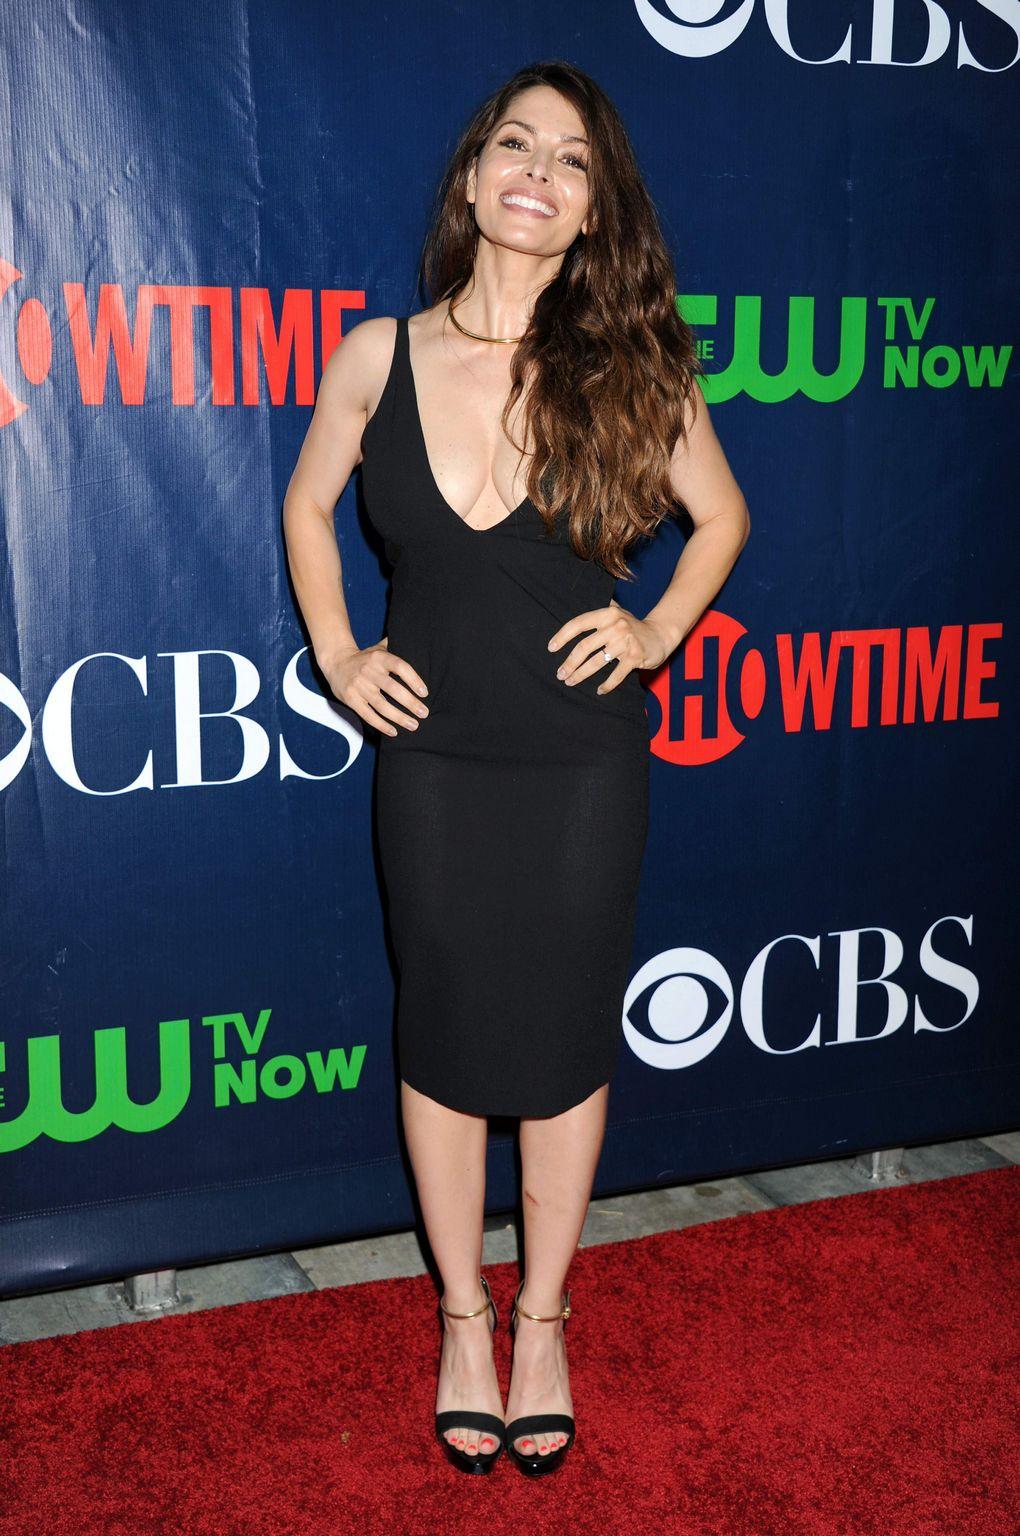 Sarah Shahi at Showtime, CBS and The CWs TCA Summer Press Tour party-4